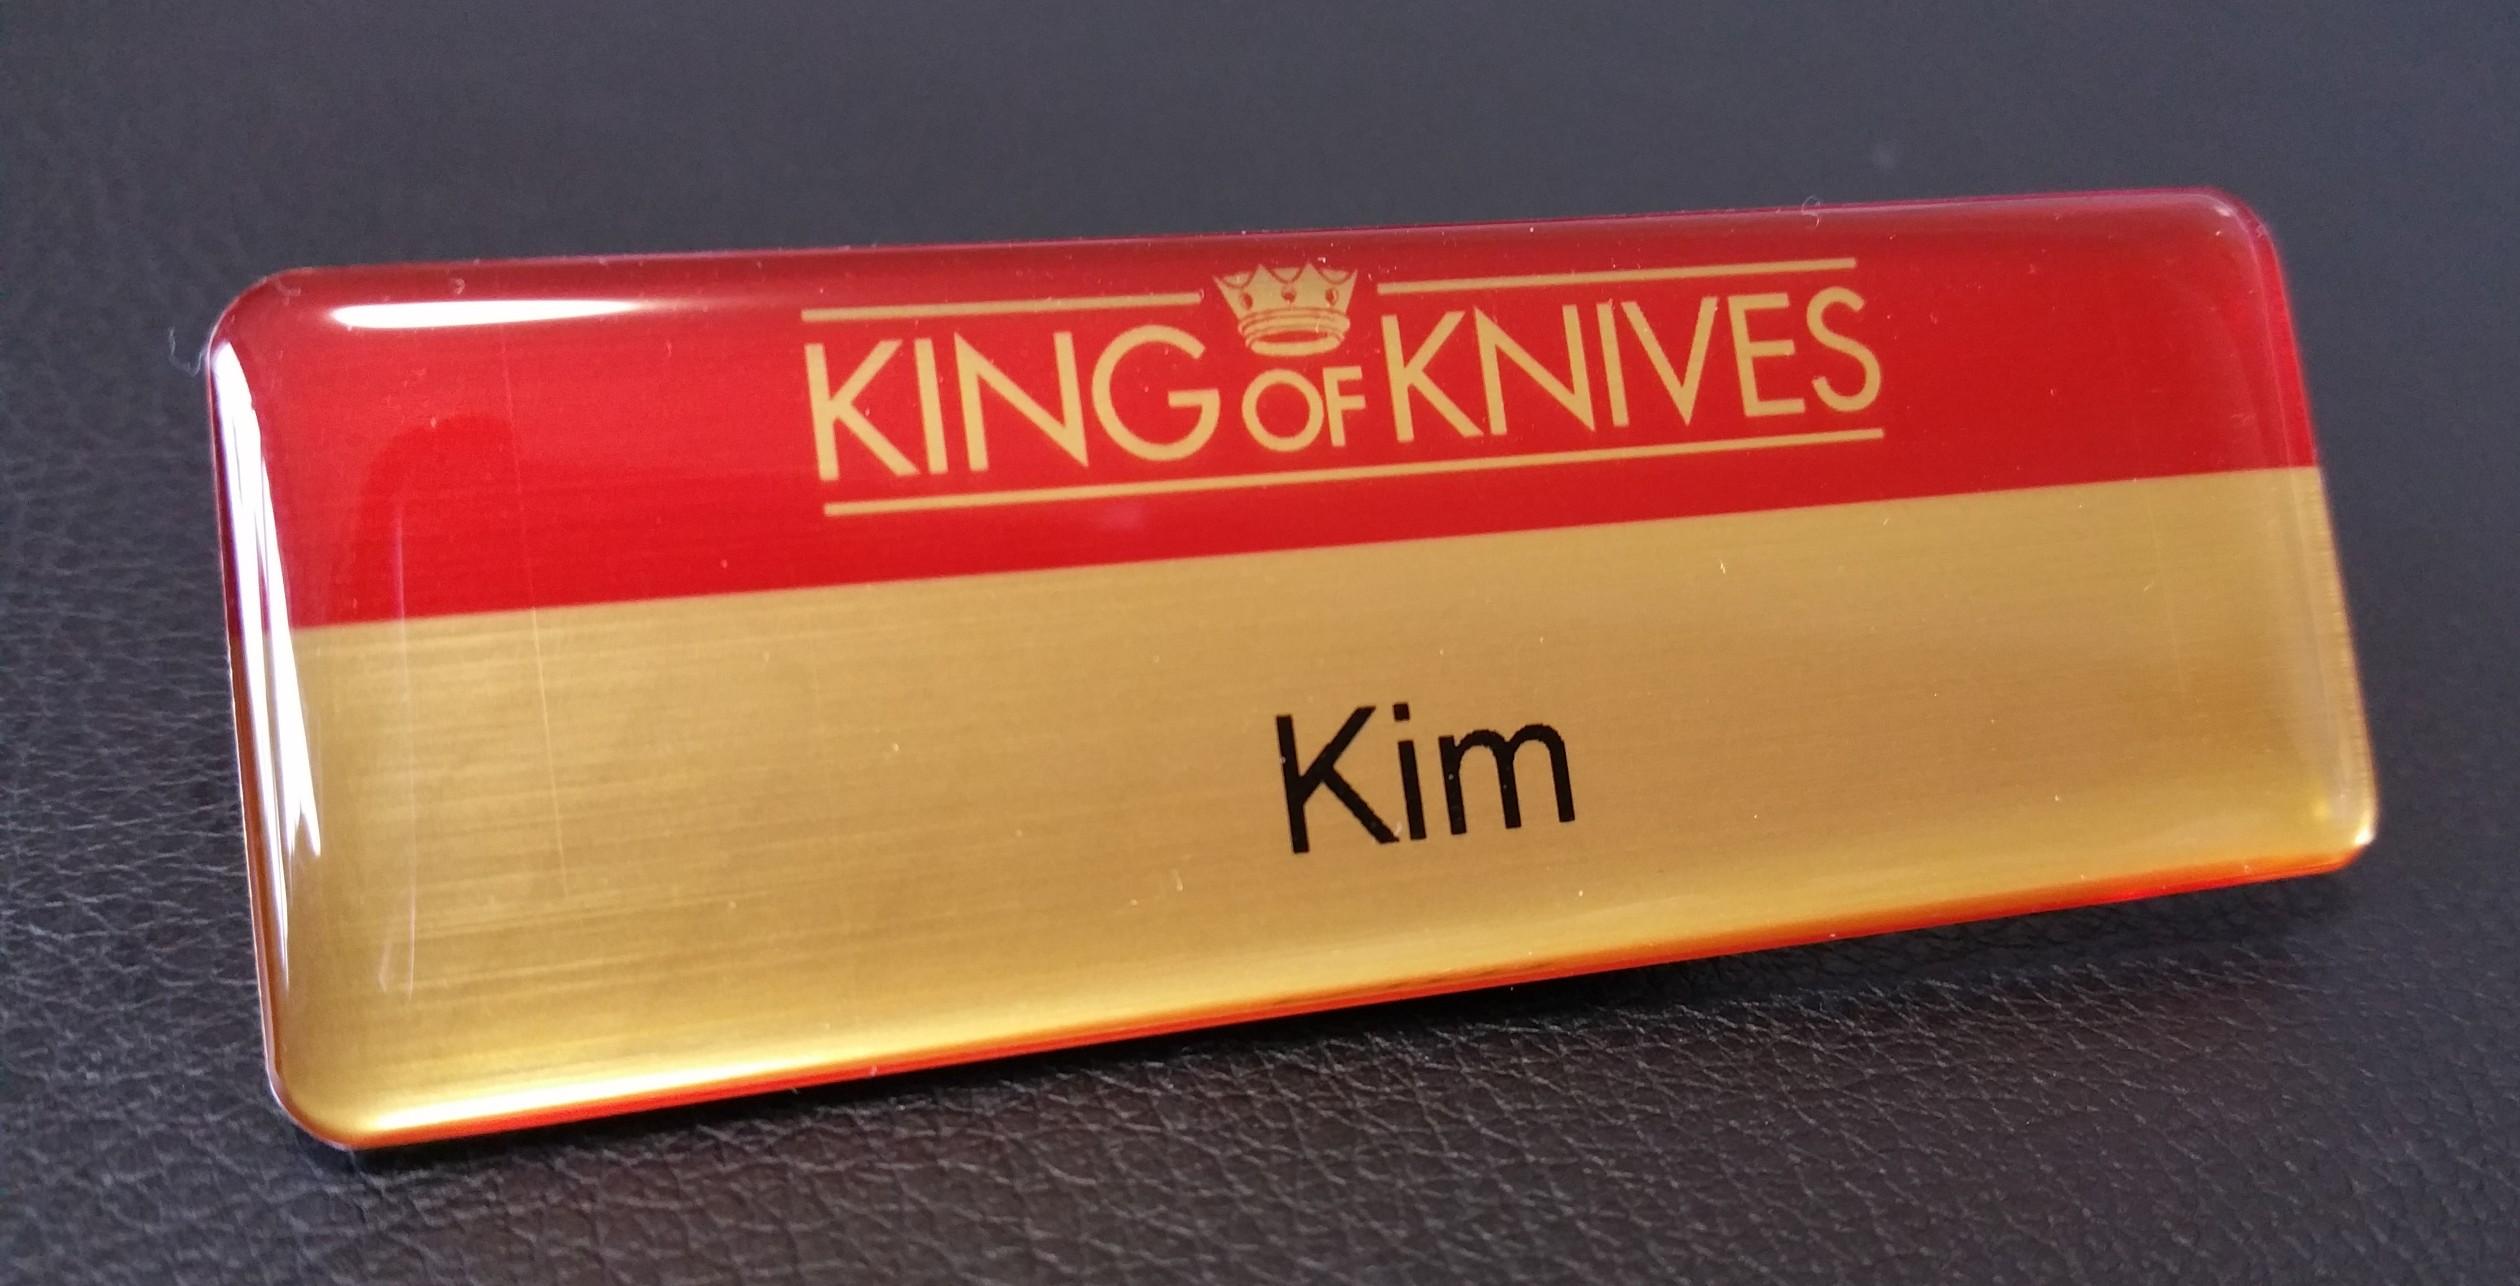 Design you own Custom Name Badges Lanyards & ID Tags Australia